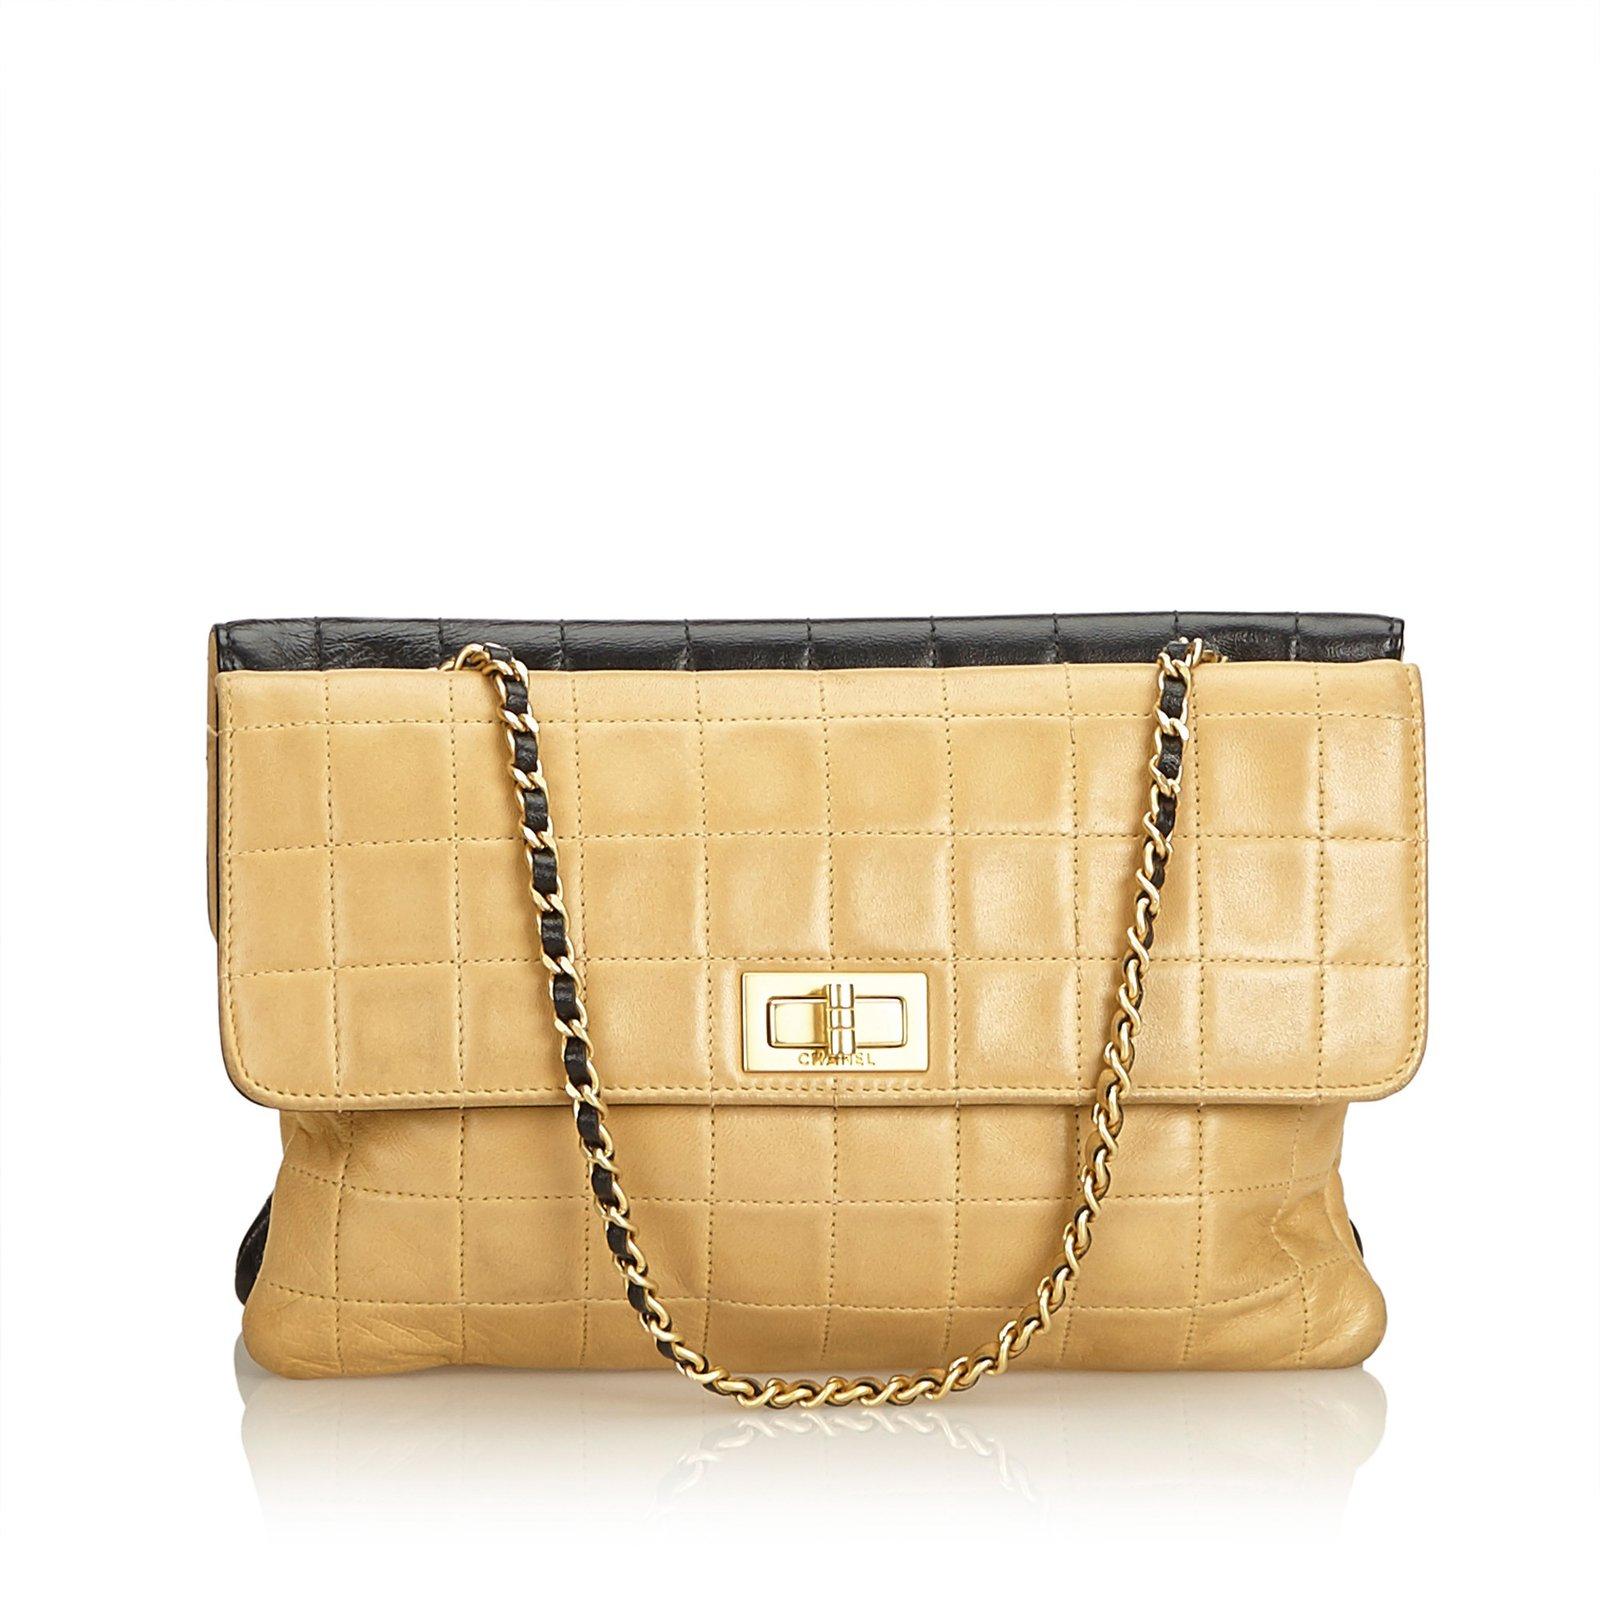 Chanel Double Sided Chocolate Bar Lambskin Flap Handbags Leather Brown 33142ef168e2b